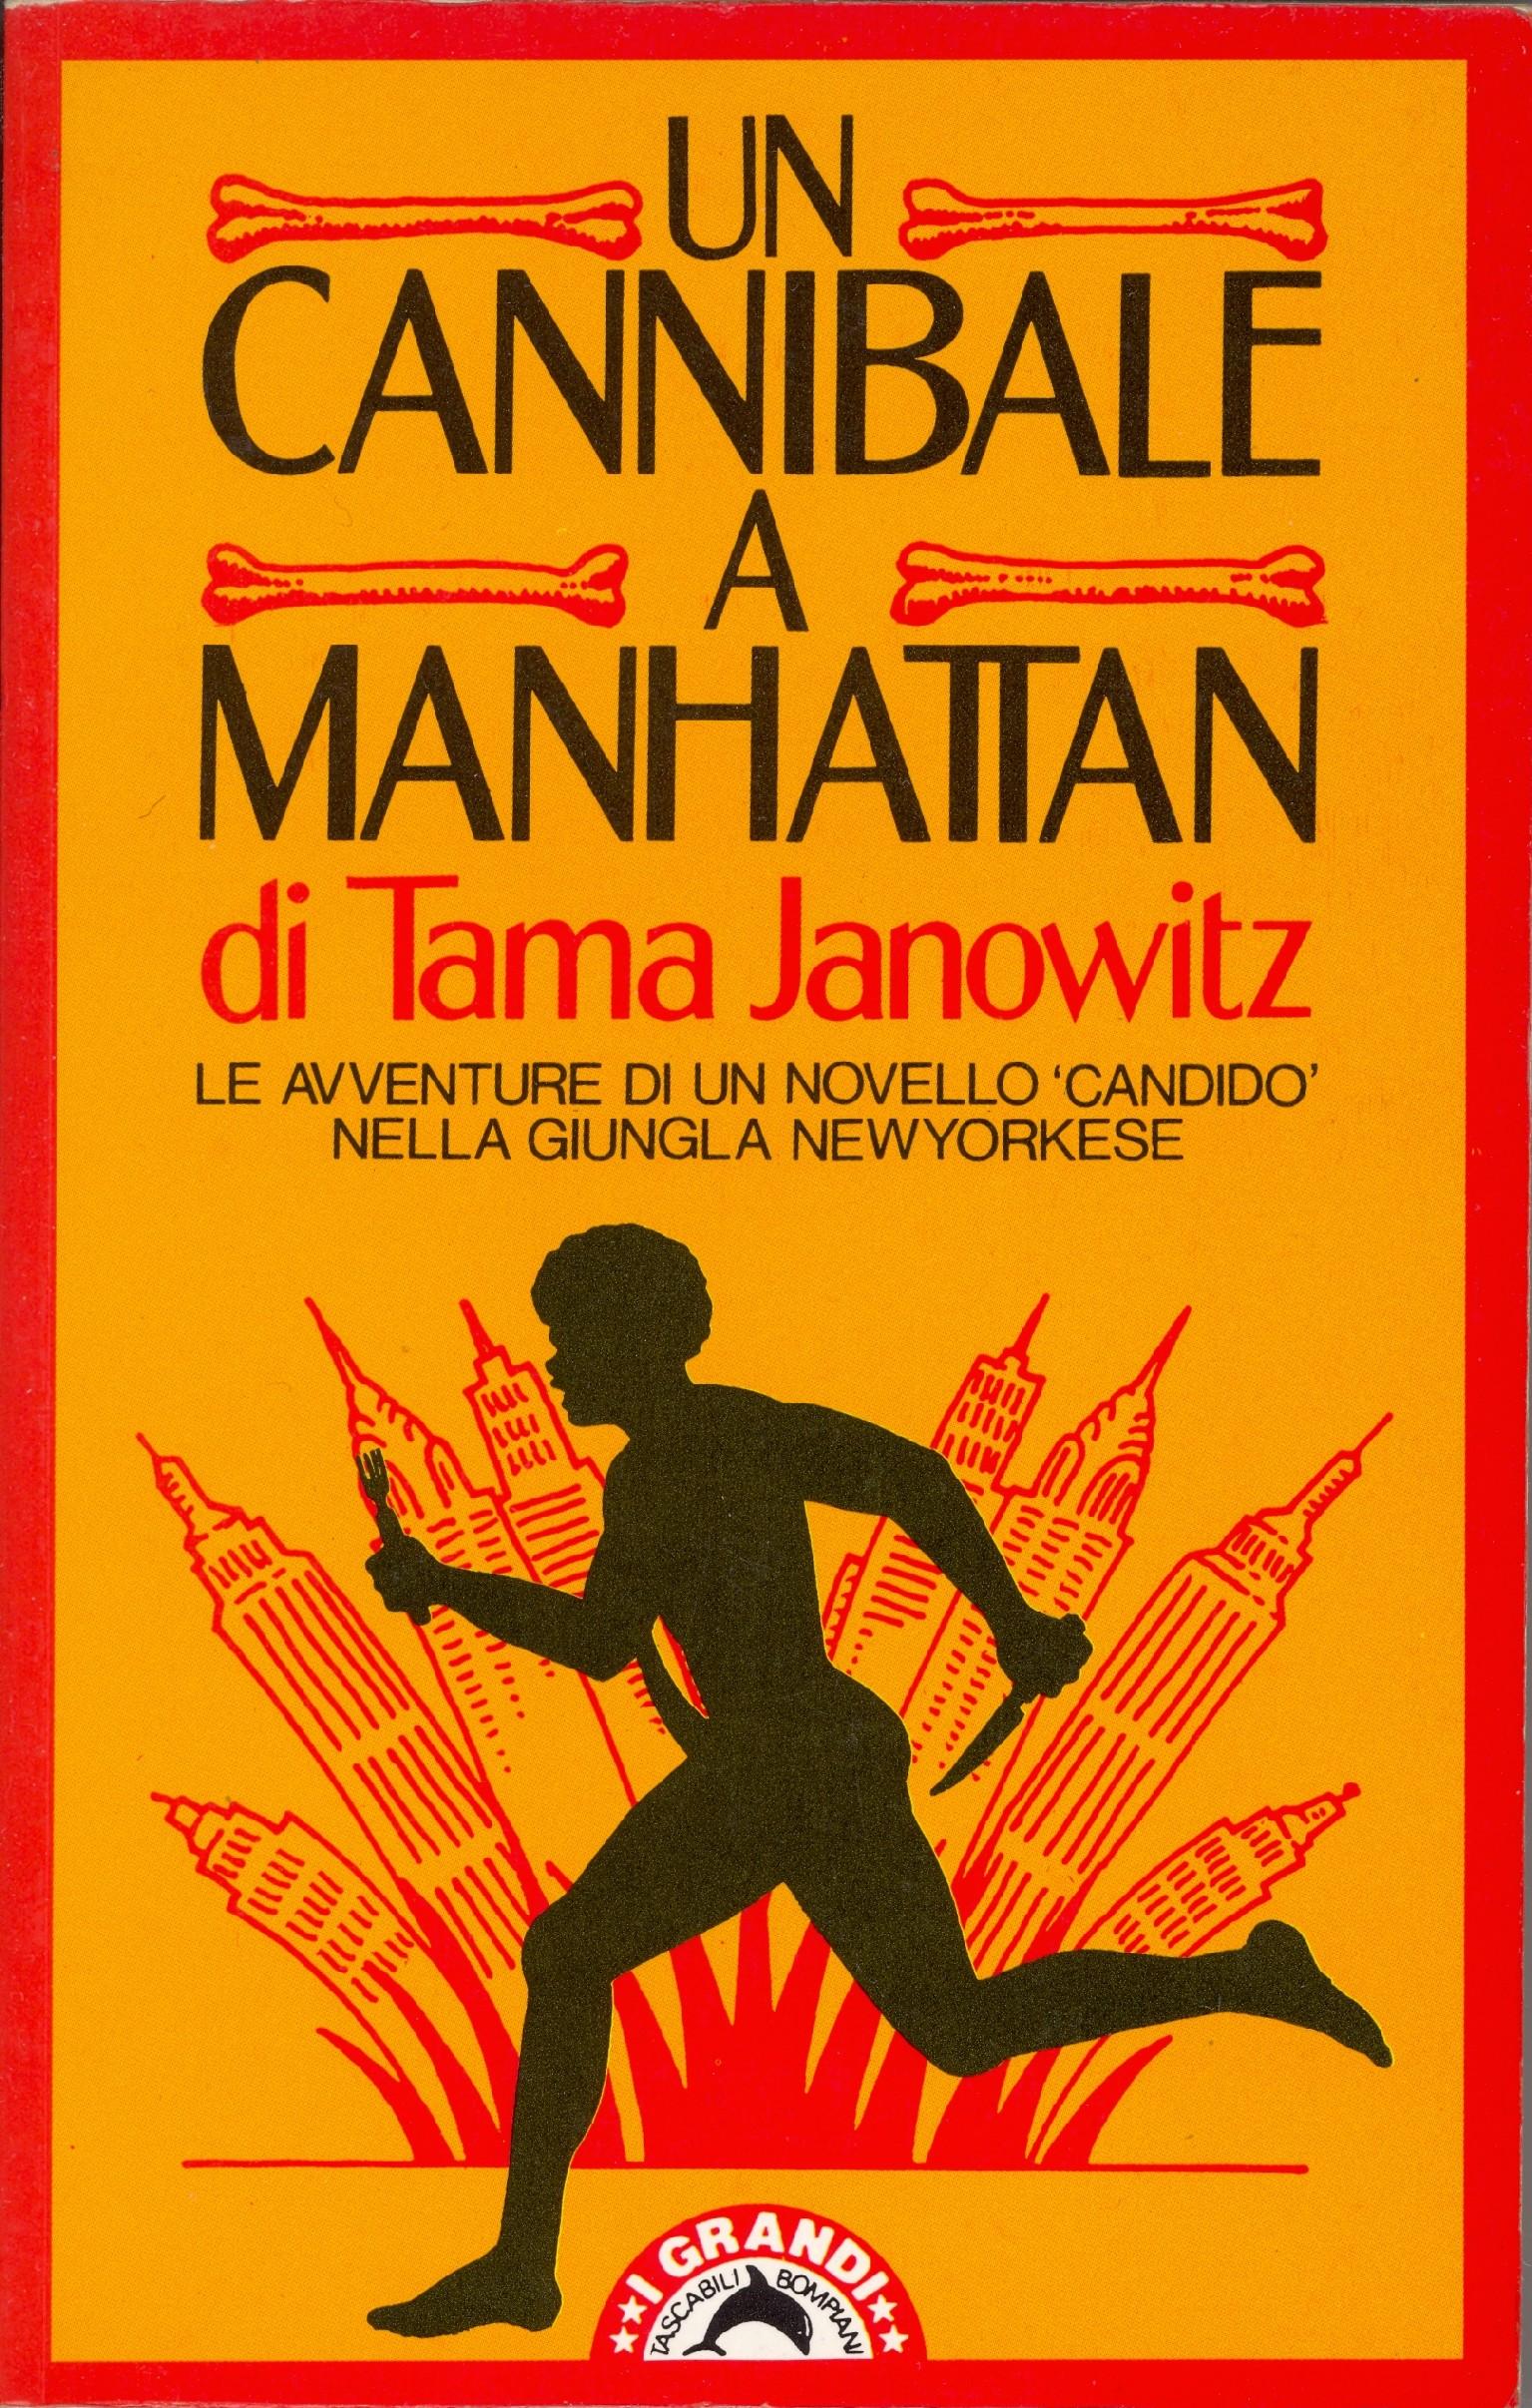 Un cannibale a Manhattan